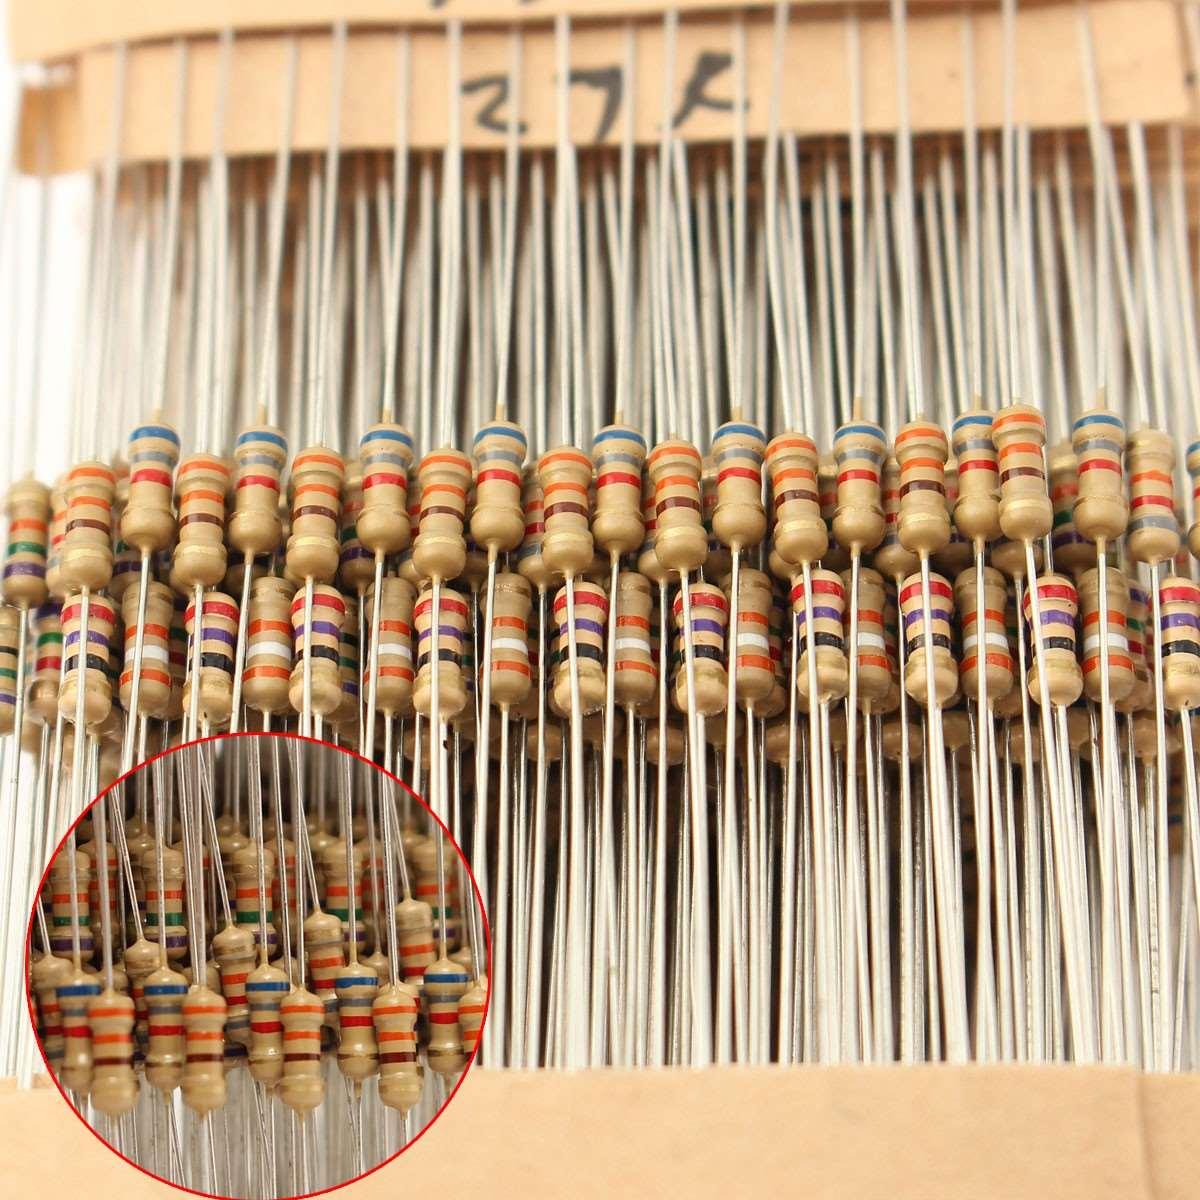 New Aiirval 560Pcs=56Valuesx10Pcs 1/4W Power Metal Film Resistors Assorted Kit 1 Ohm ~ 10M Ohm 1% Tolerance Resistor Set